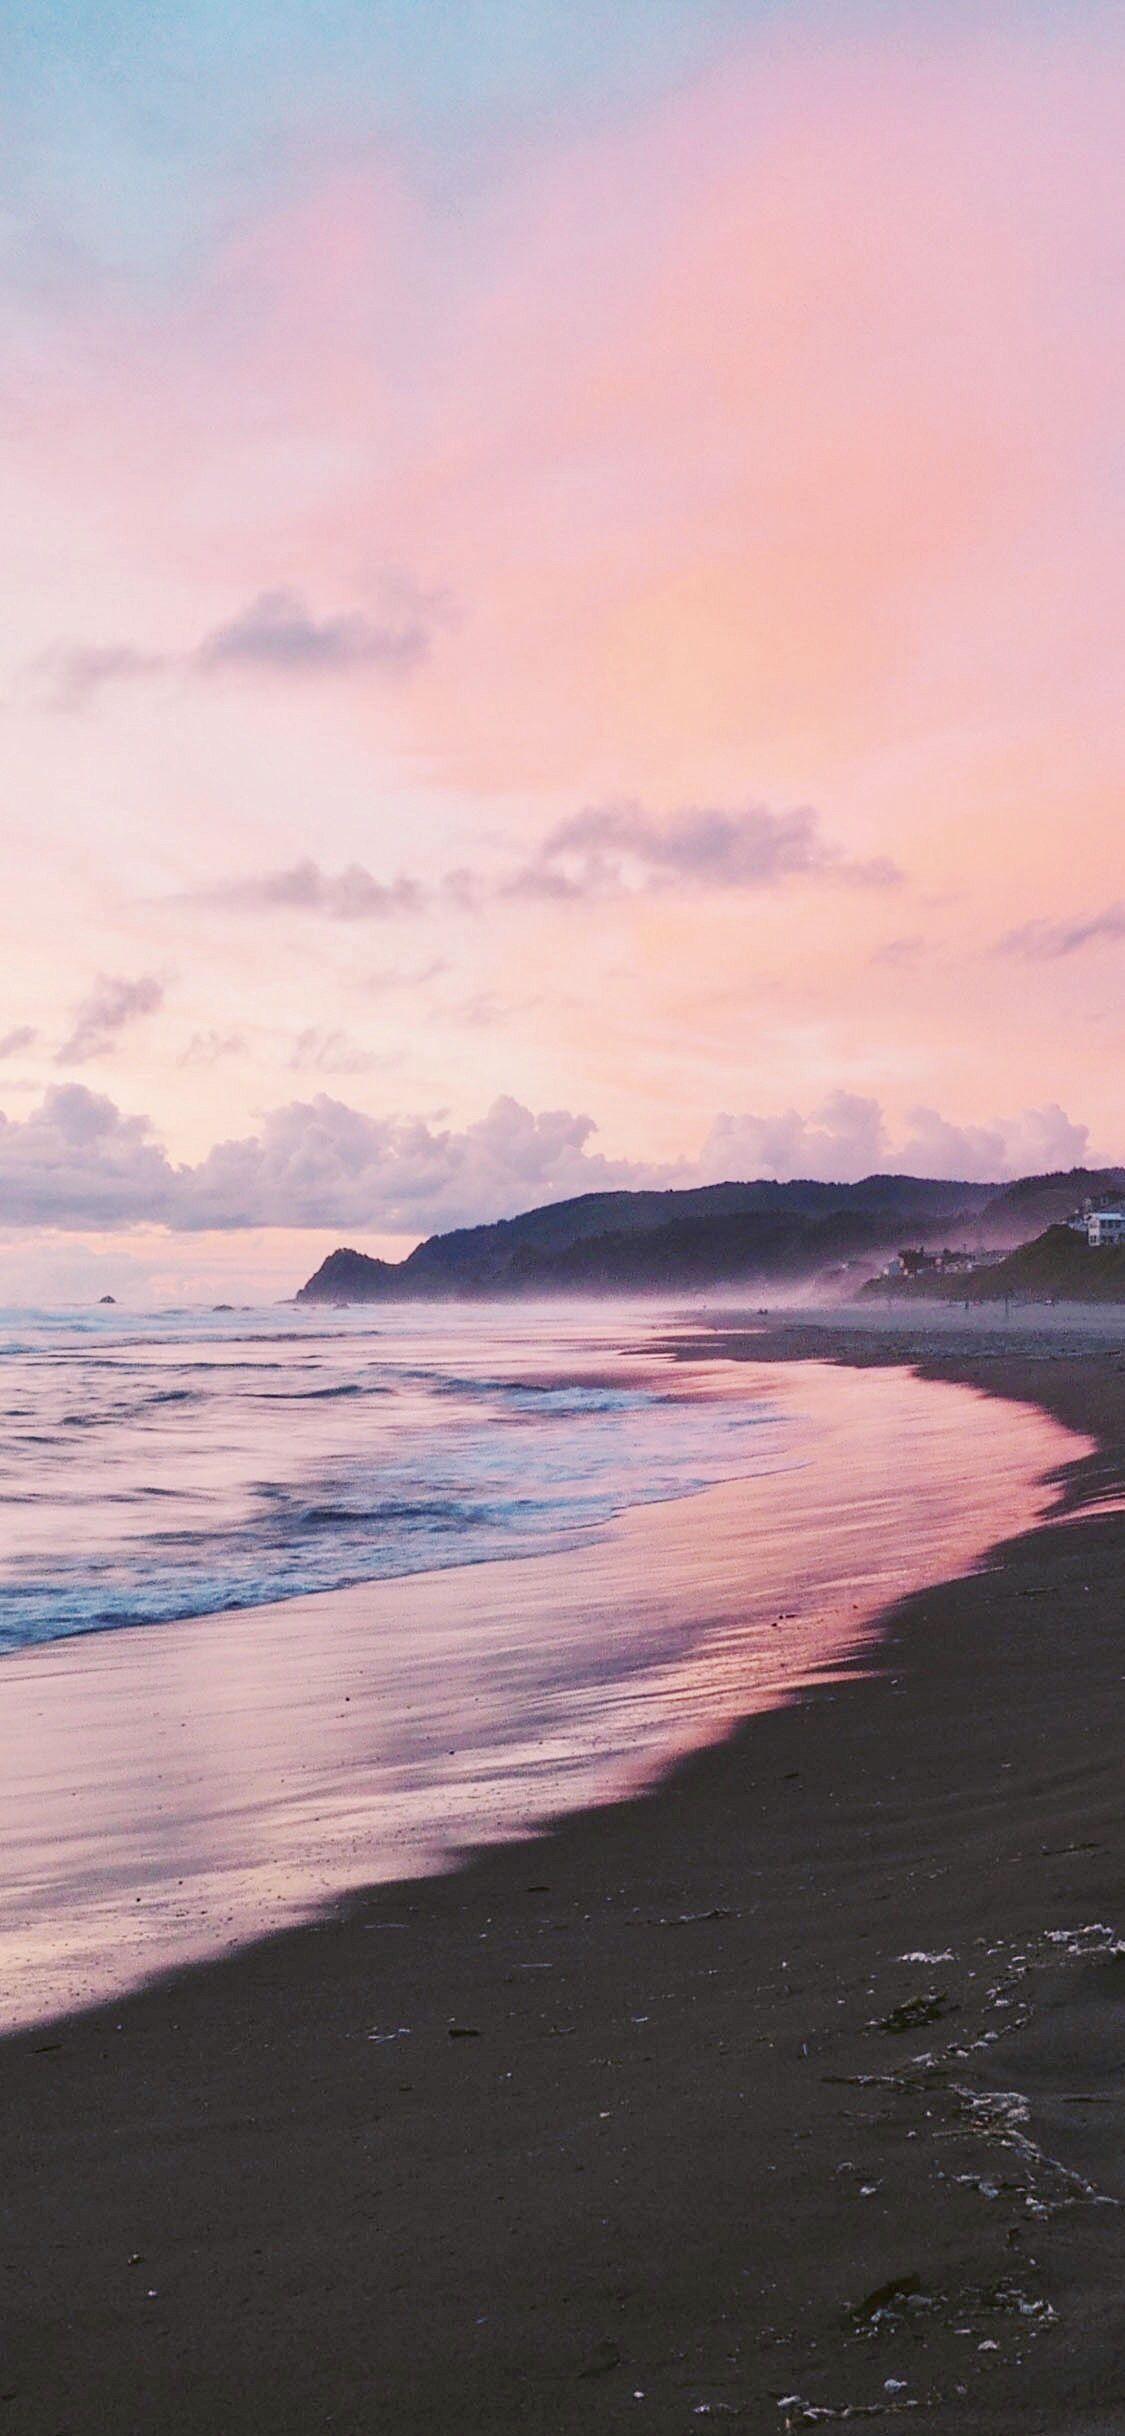 Pink Sunset Iphone Wallpaper Sunset Iphone Wallpaper Beach Wallpaper Sunset Wallpaper